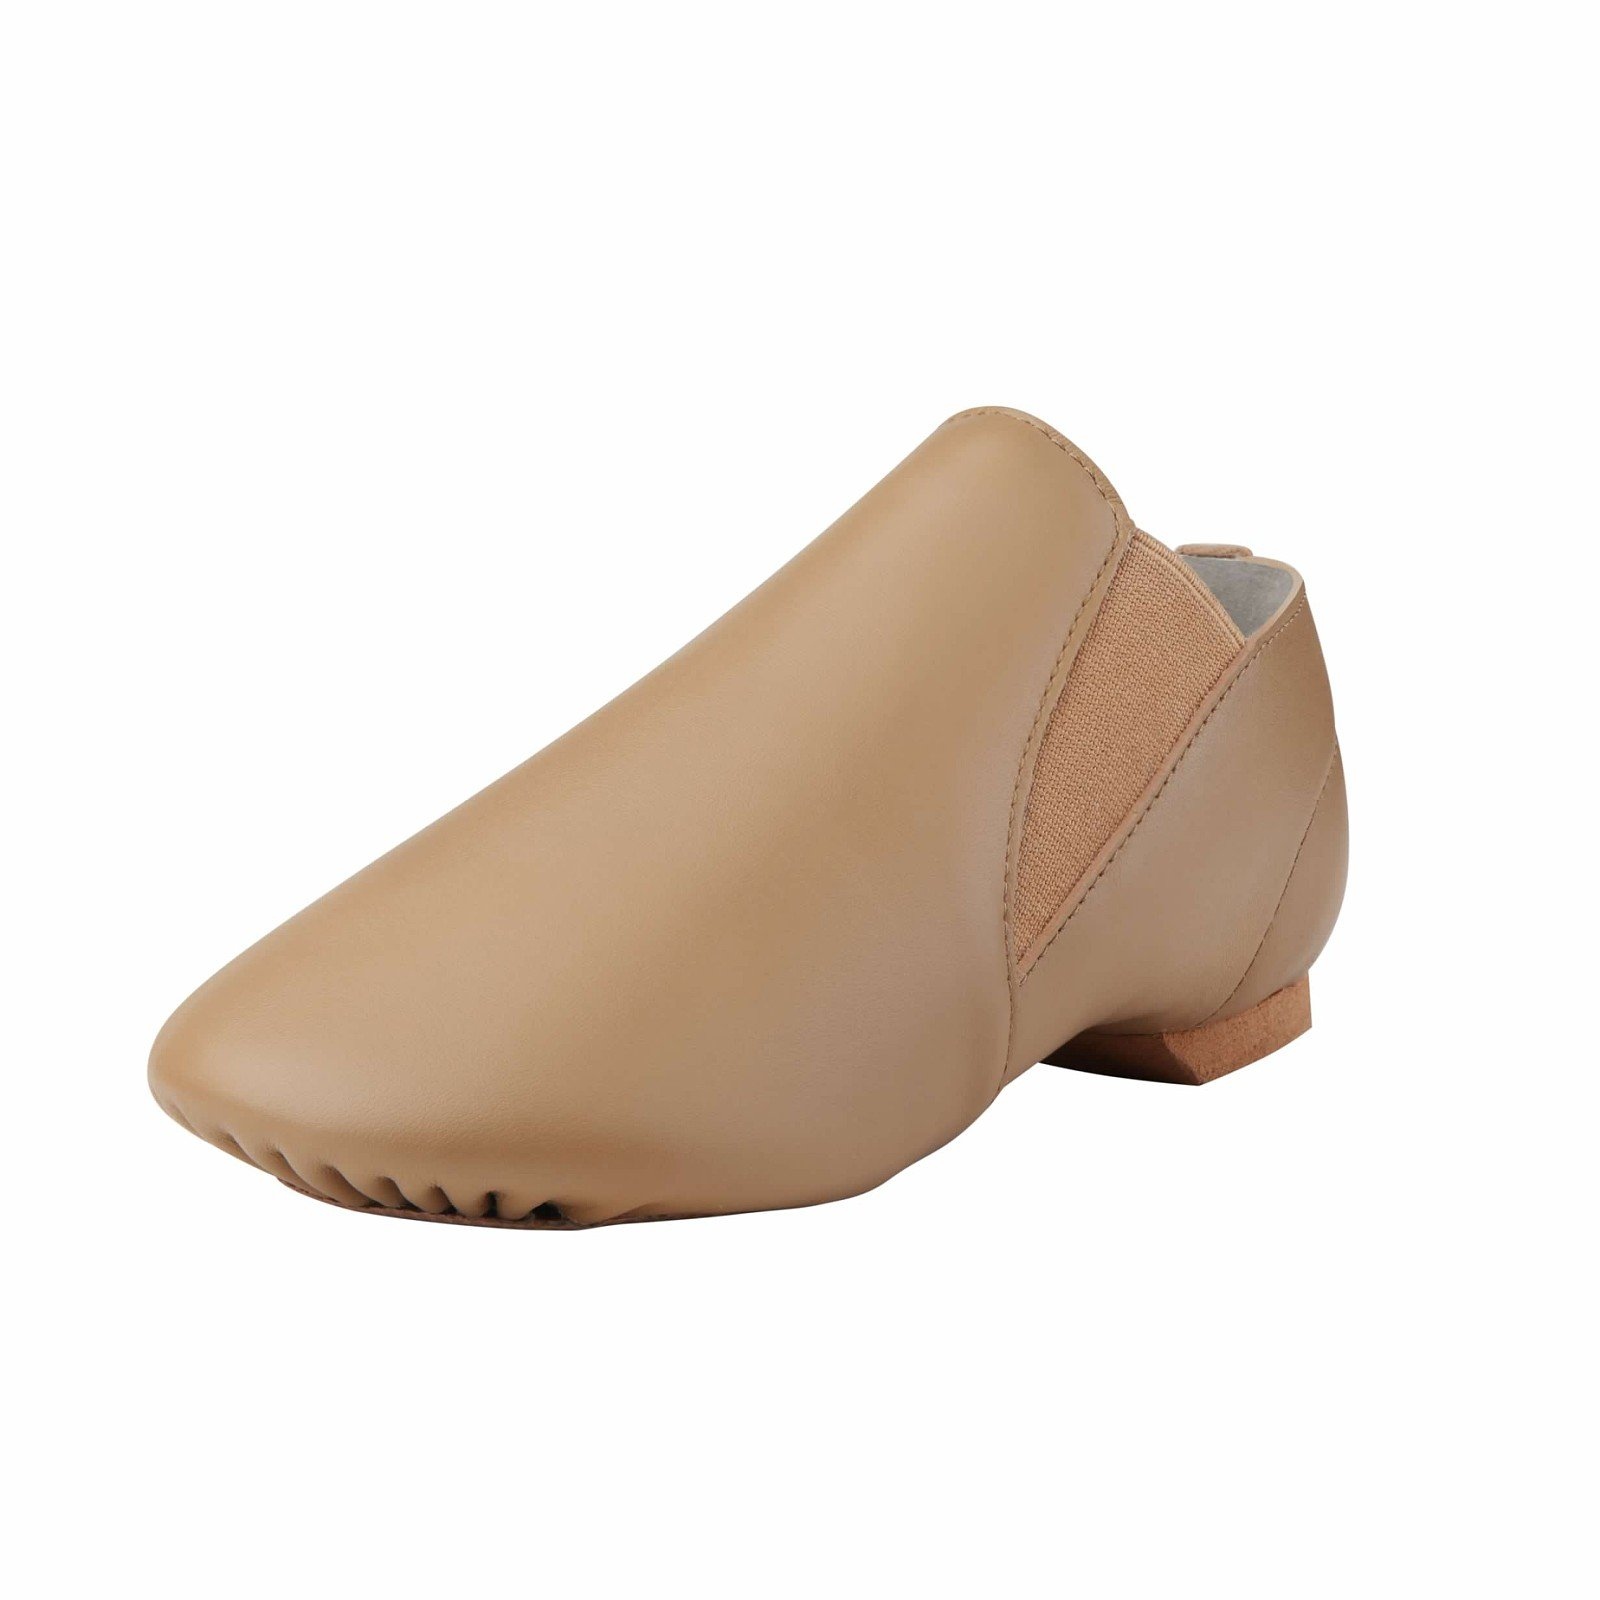 Dynadans Women's Leather Upper Slip-on Jazz Shoe with Elastics Brown 8M